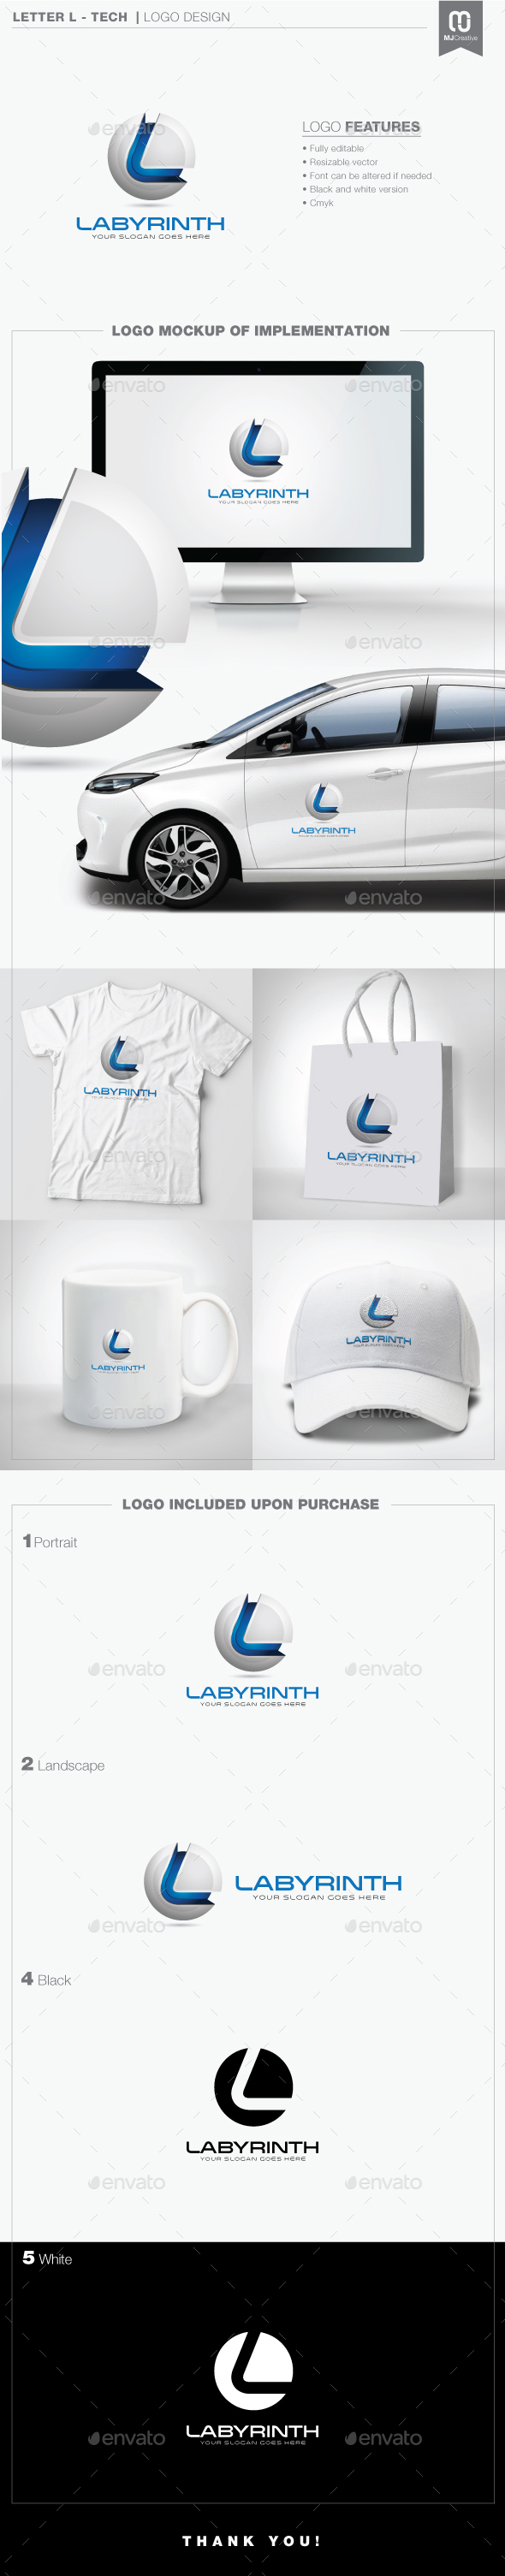 Letter L - Tech Logo